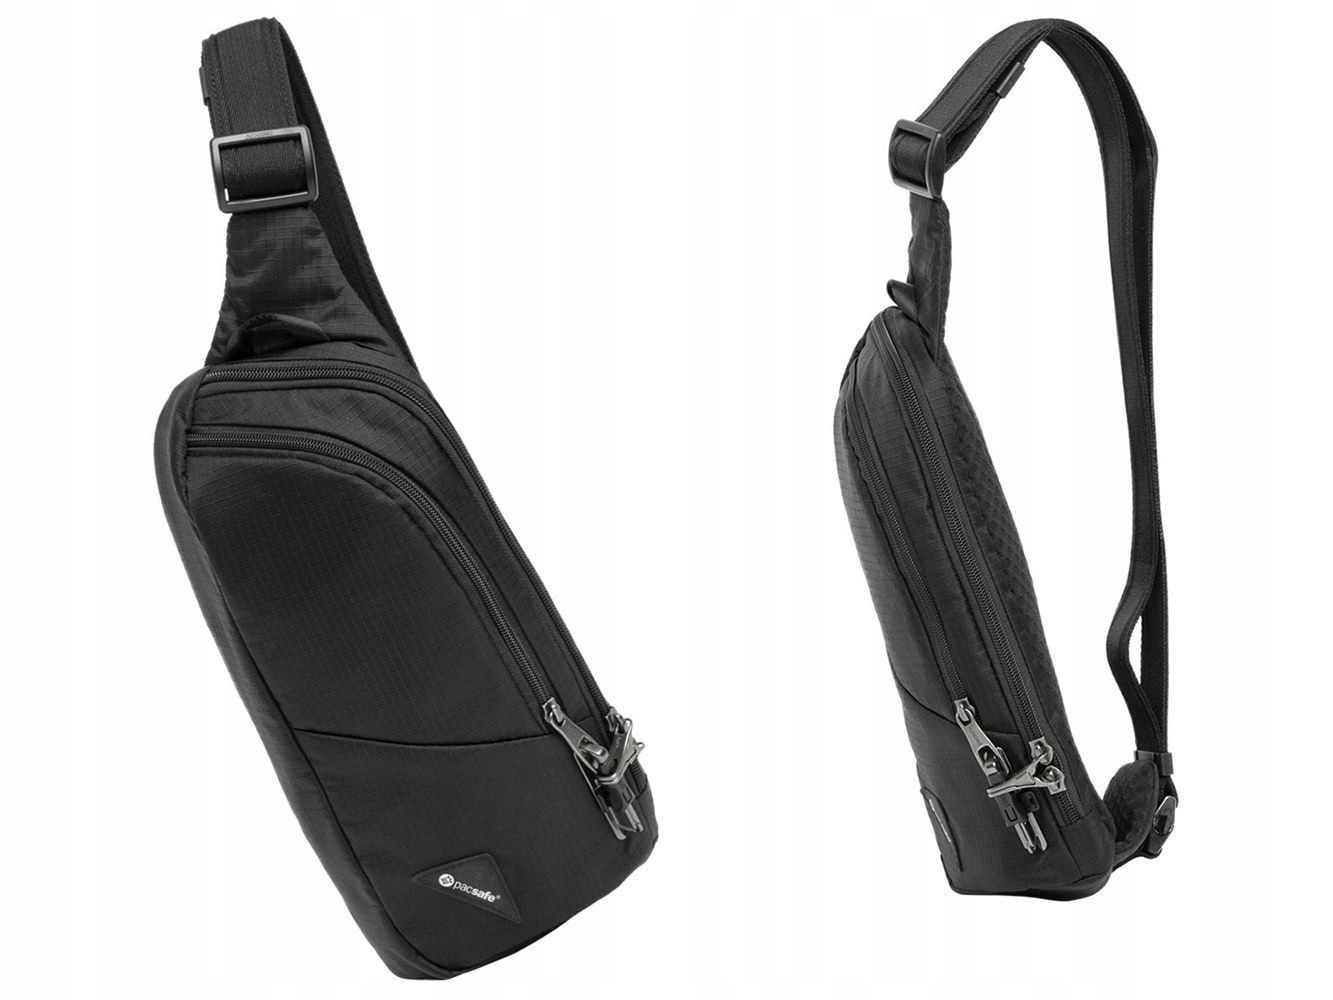 Pacsafe Vibe 150 plecak / saszetka biodrowa nerka